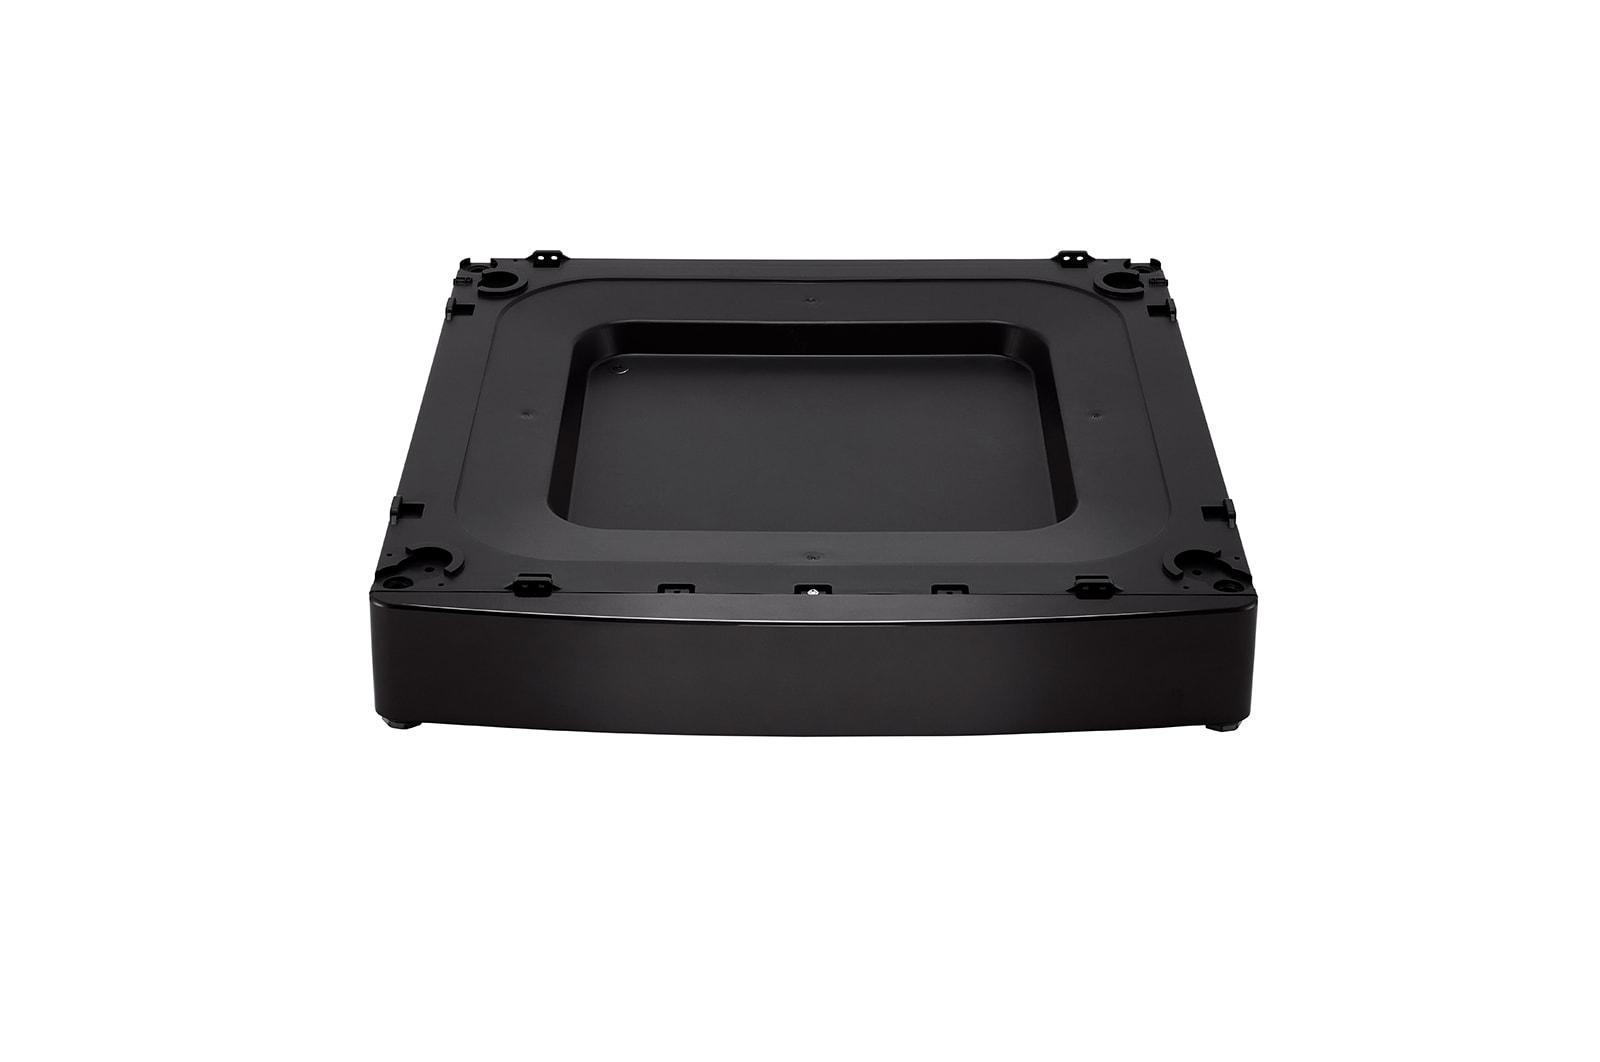 LG AppliancesAda Compliant Laundry Pedestal Riser - Black Steel